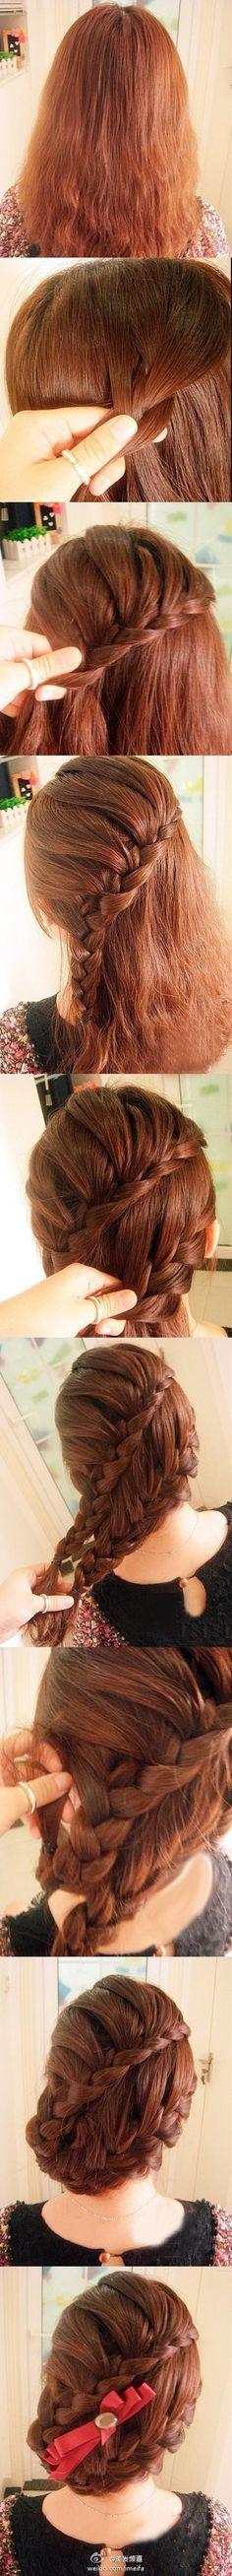 double braids updo